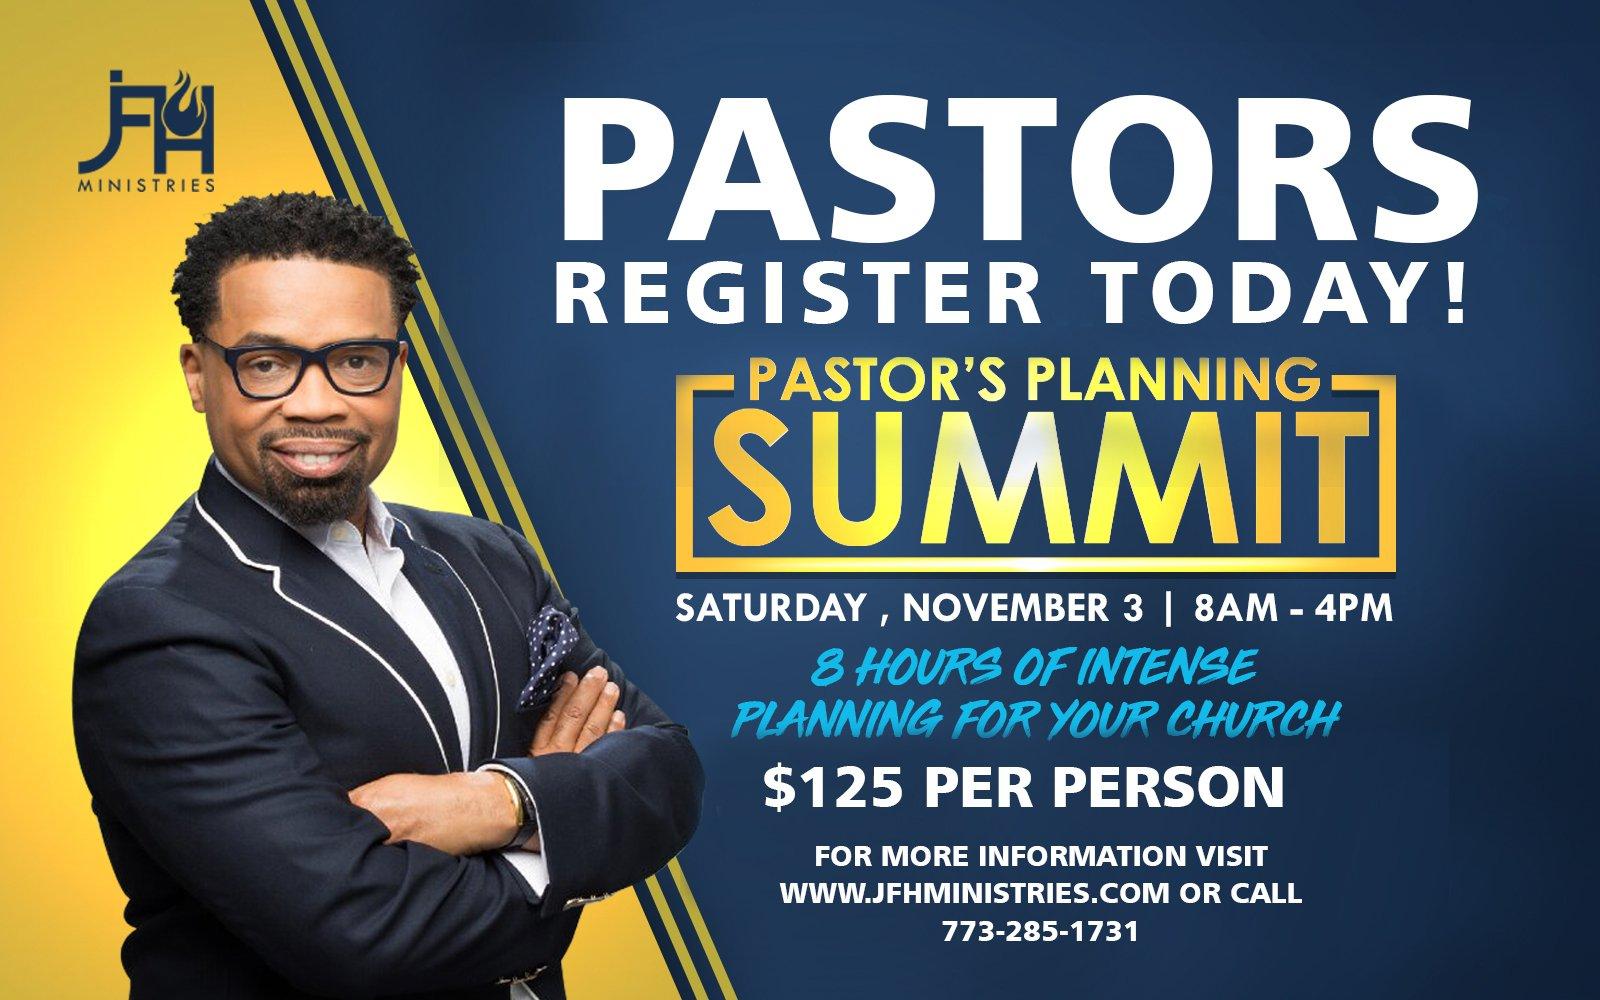 John_Hannah_Pastors_Planning_Summit_Banner_1_1600x.jpg